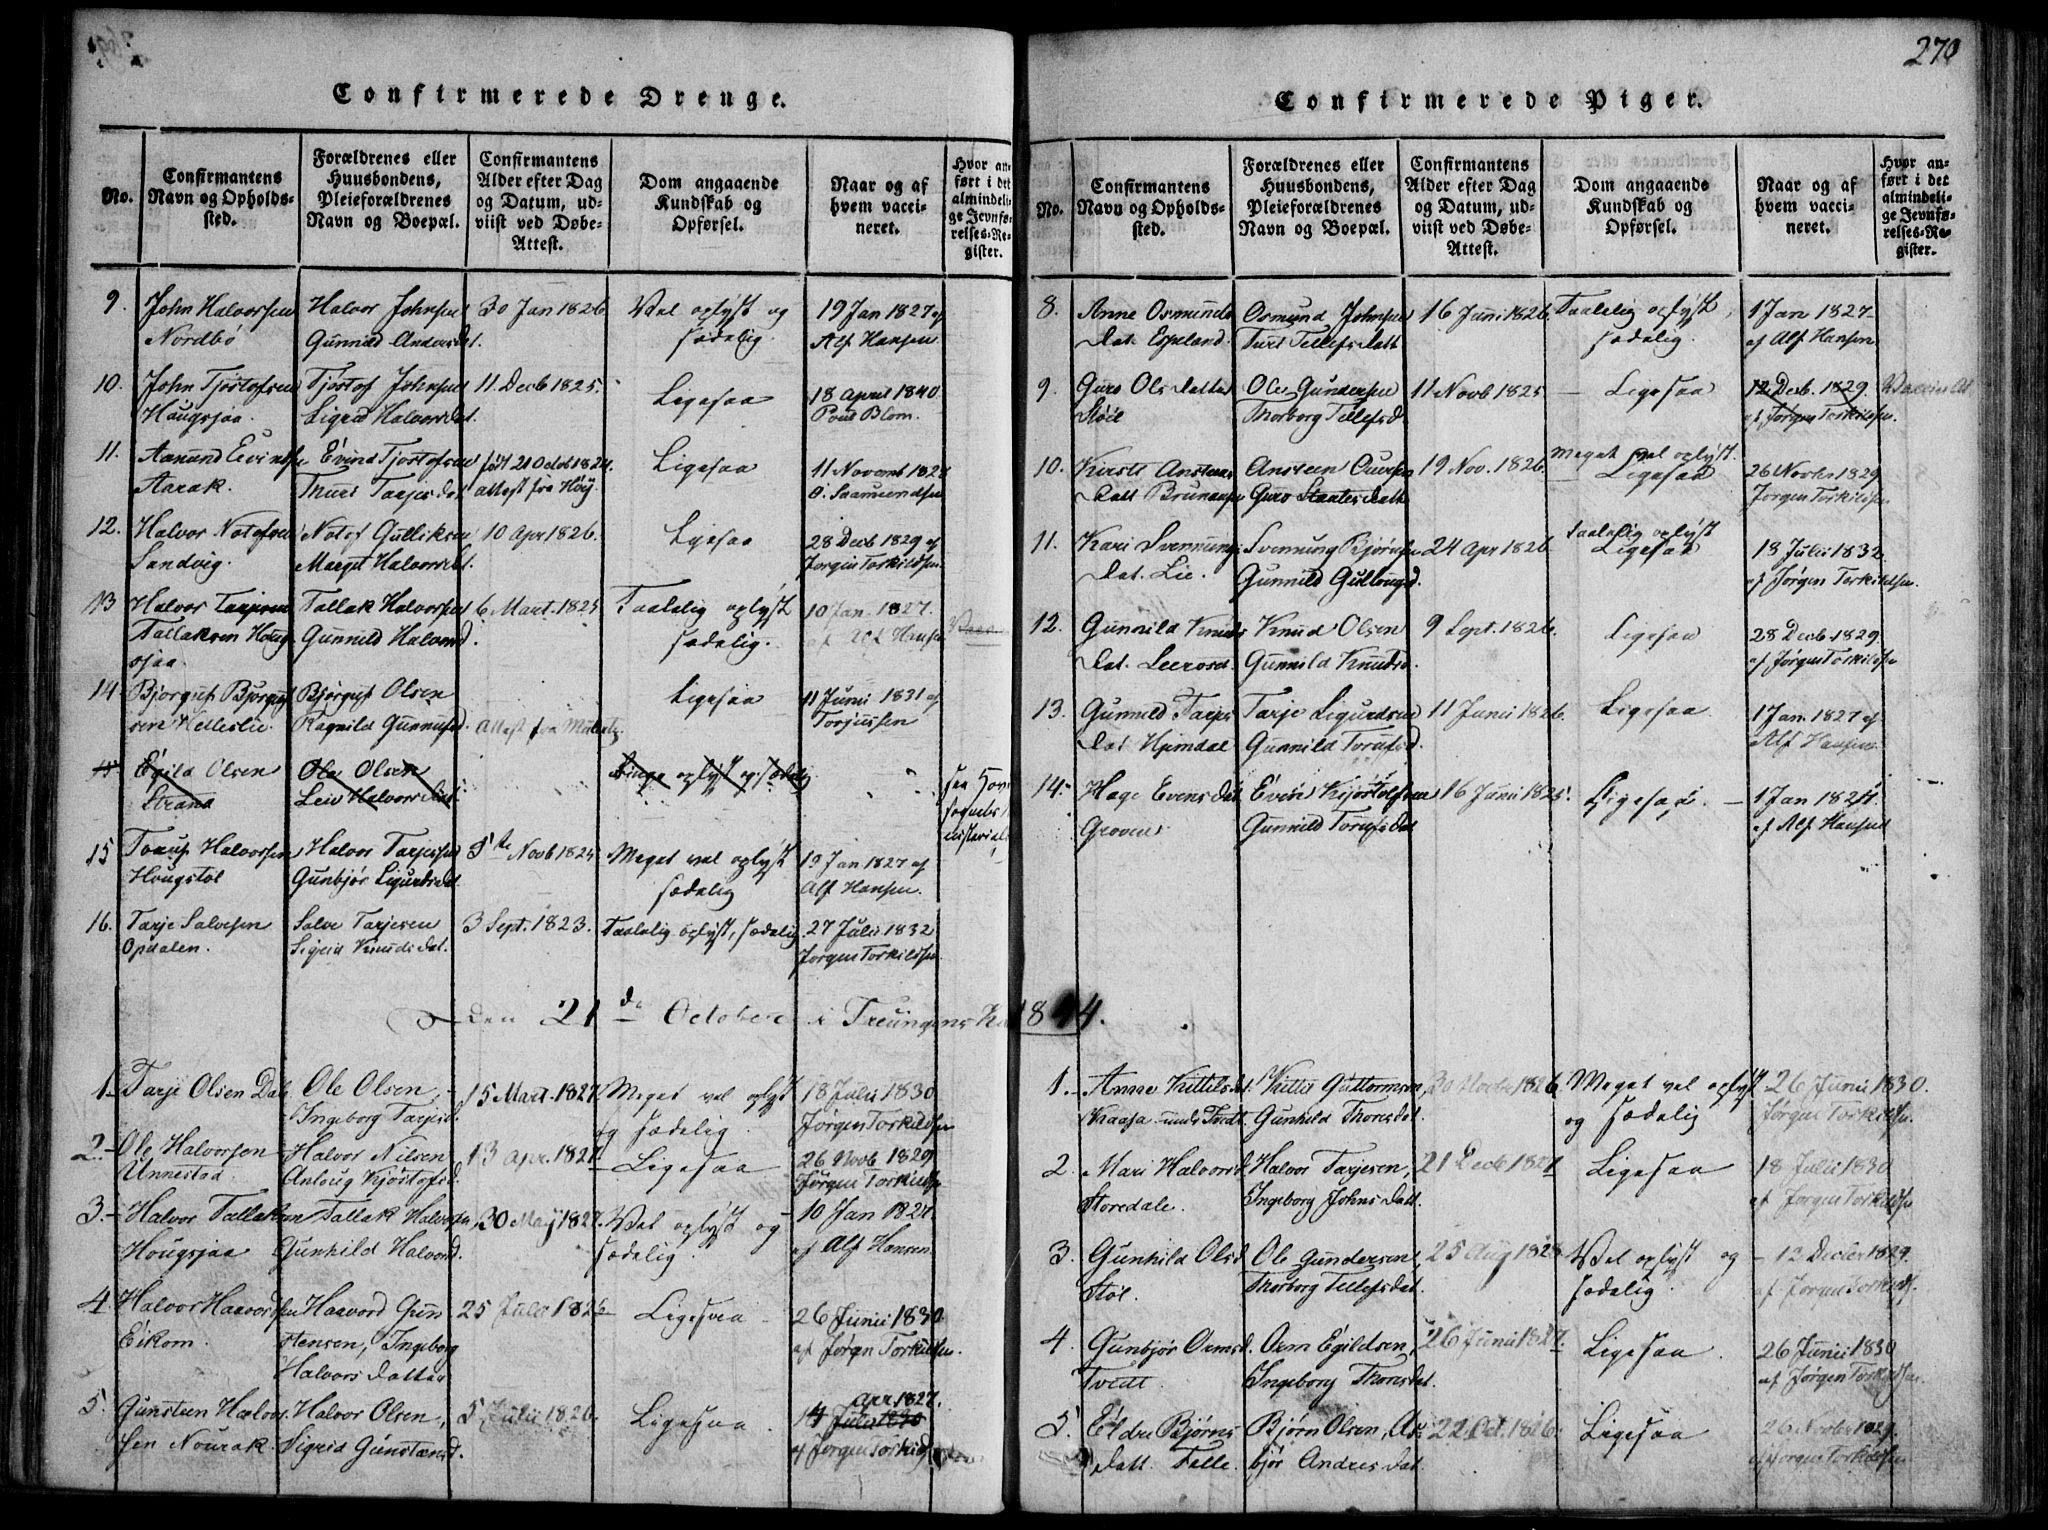 SAKO, Nissedal kirkebøker, F/Fb/L0001: Ministerialbok nr. II 1, 1814-1845, s. 270